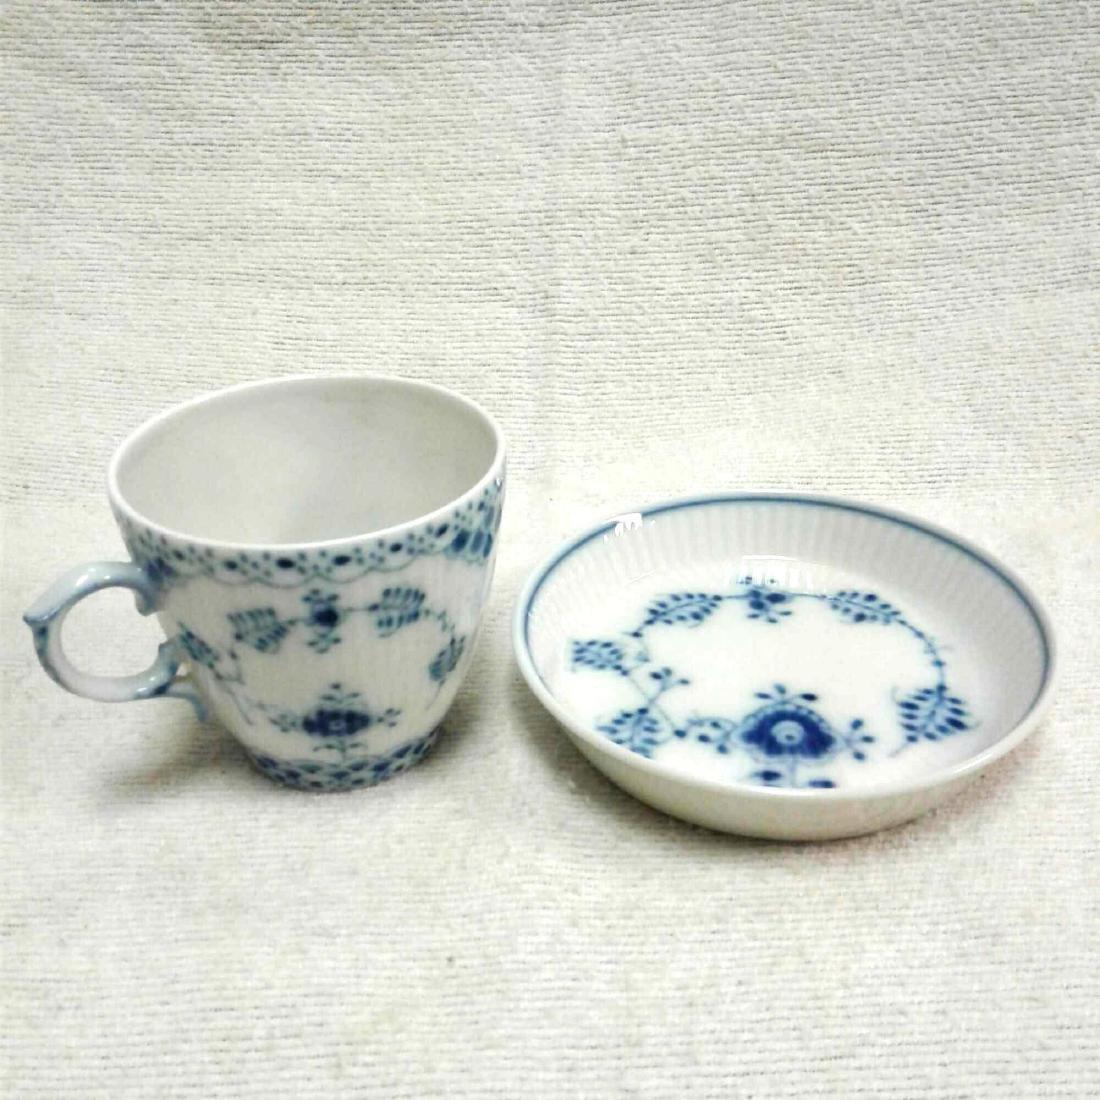 Royal Copenhagen Fine China Tea Cup and Saucer